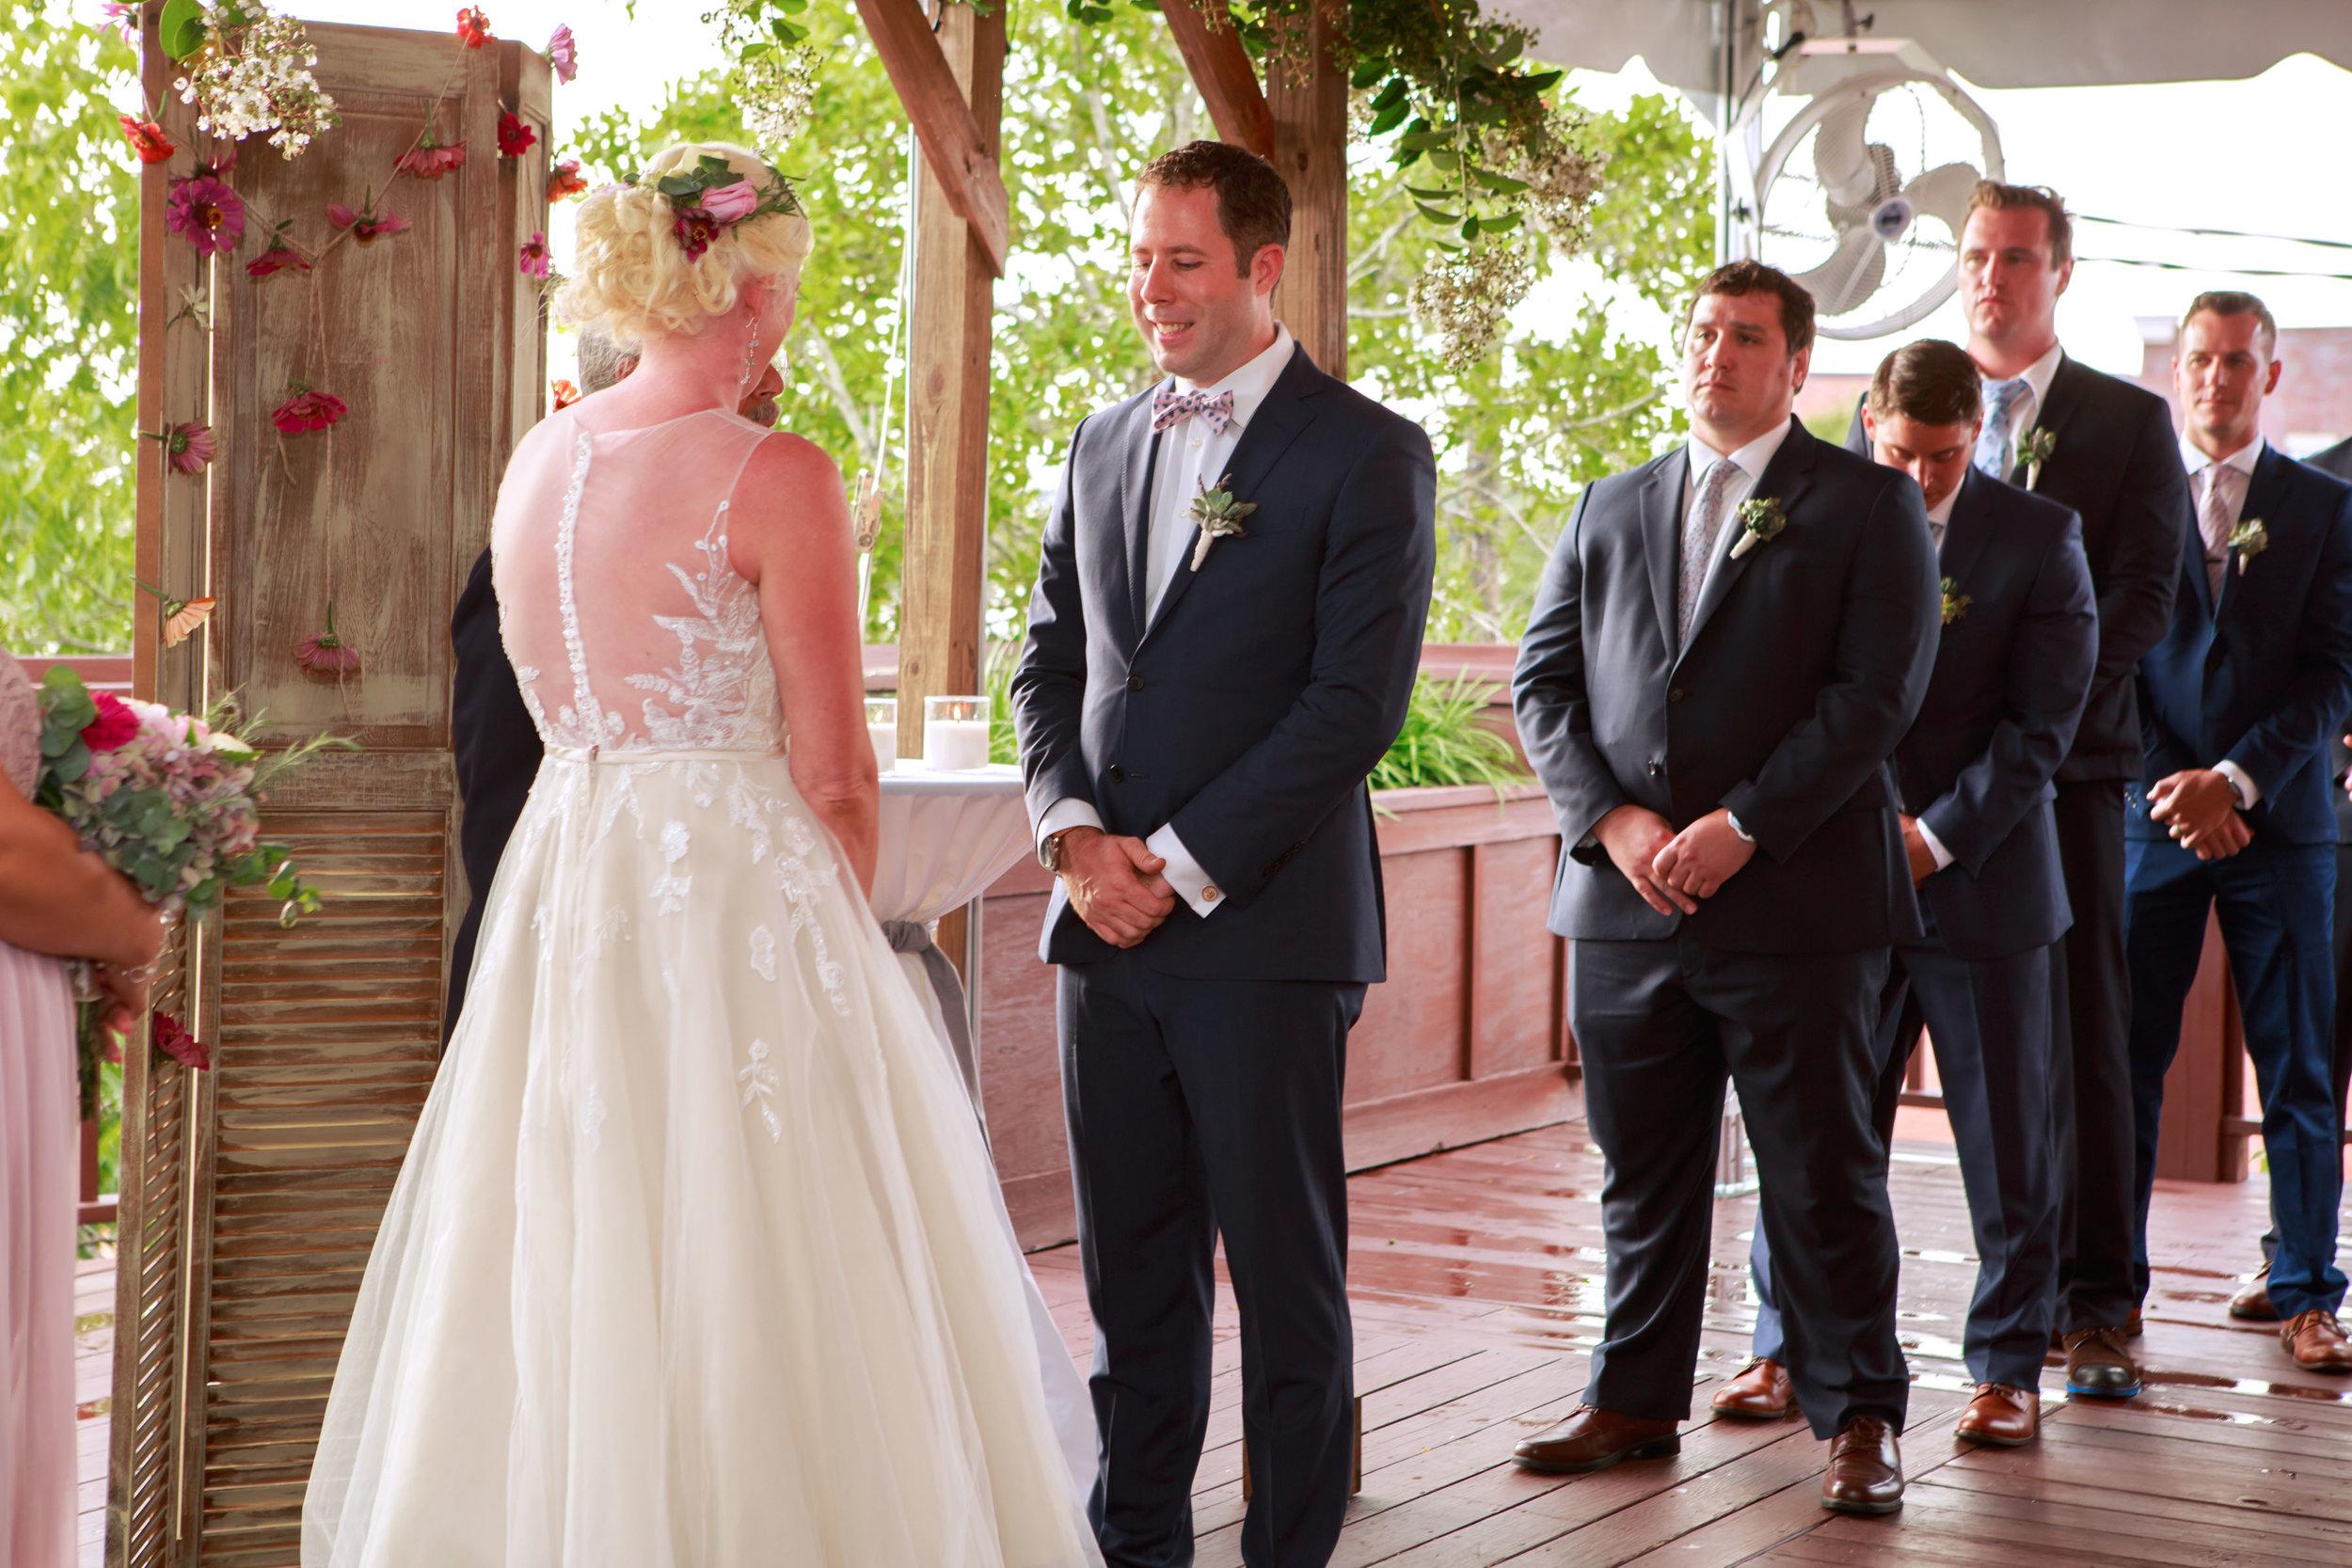 128-South-Wedding-Wilmington-NC-Photographer-Ceremony-014.jpg